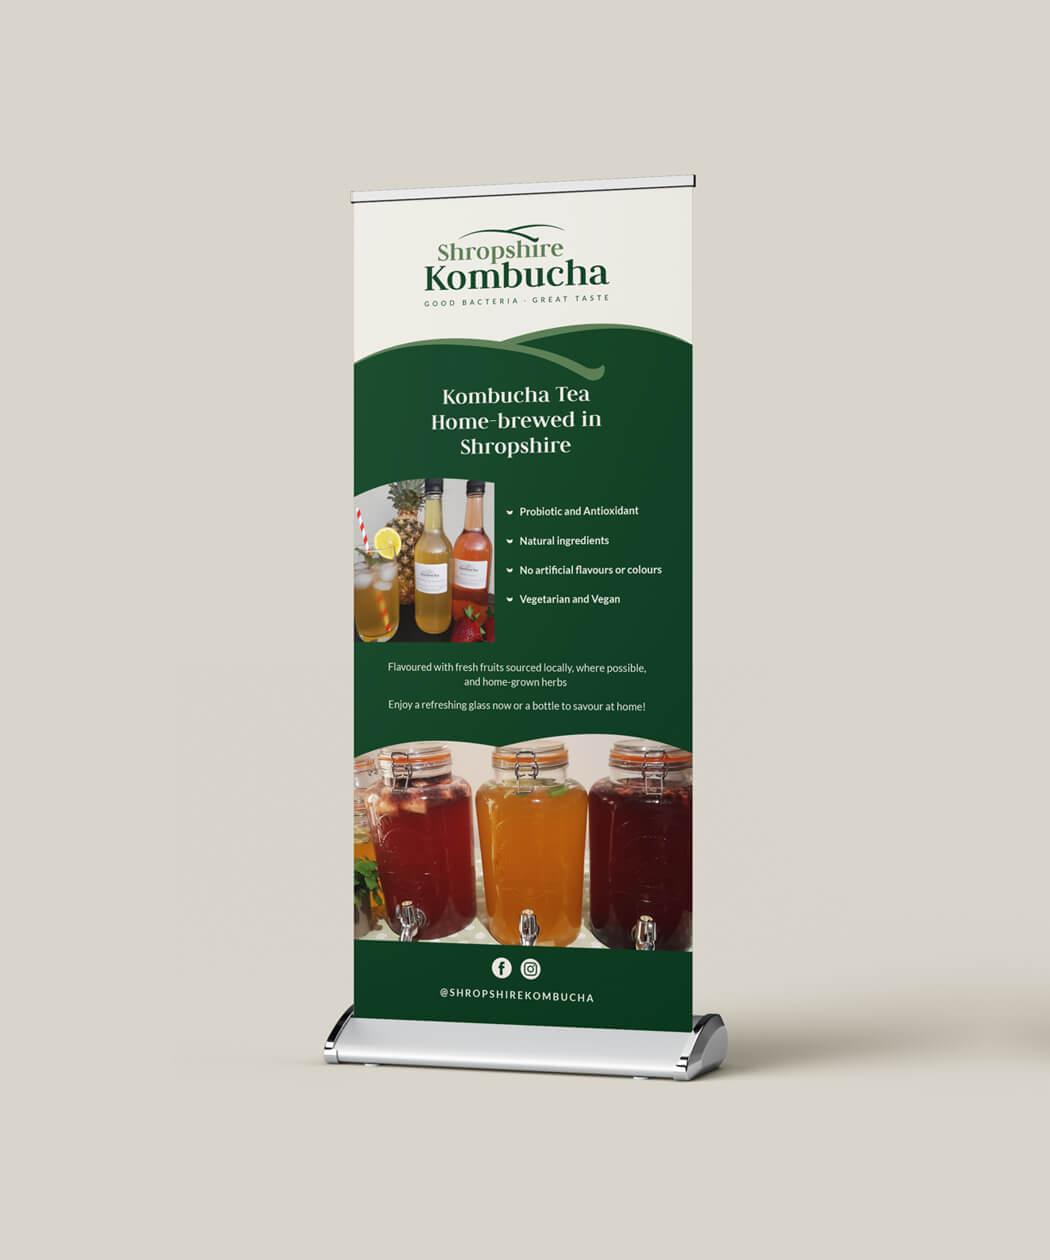 Shropshire Kombucha roller banner design